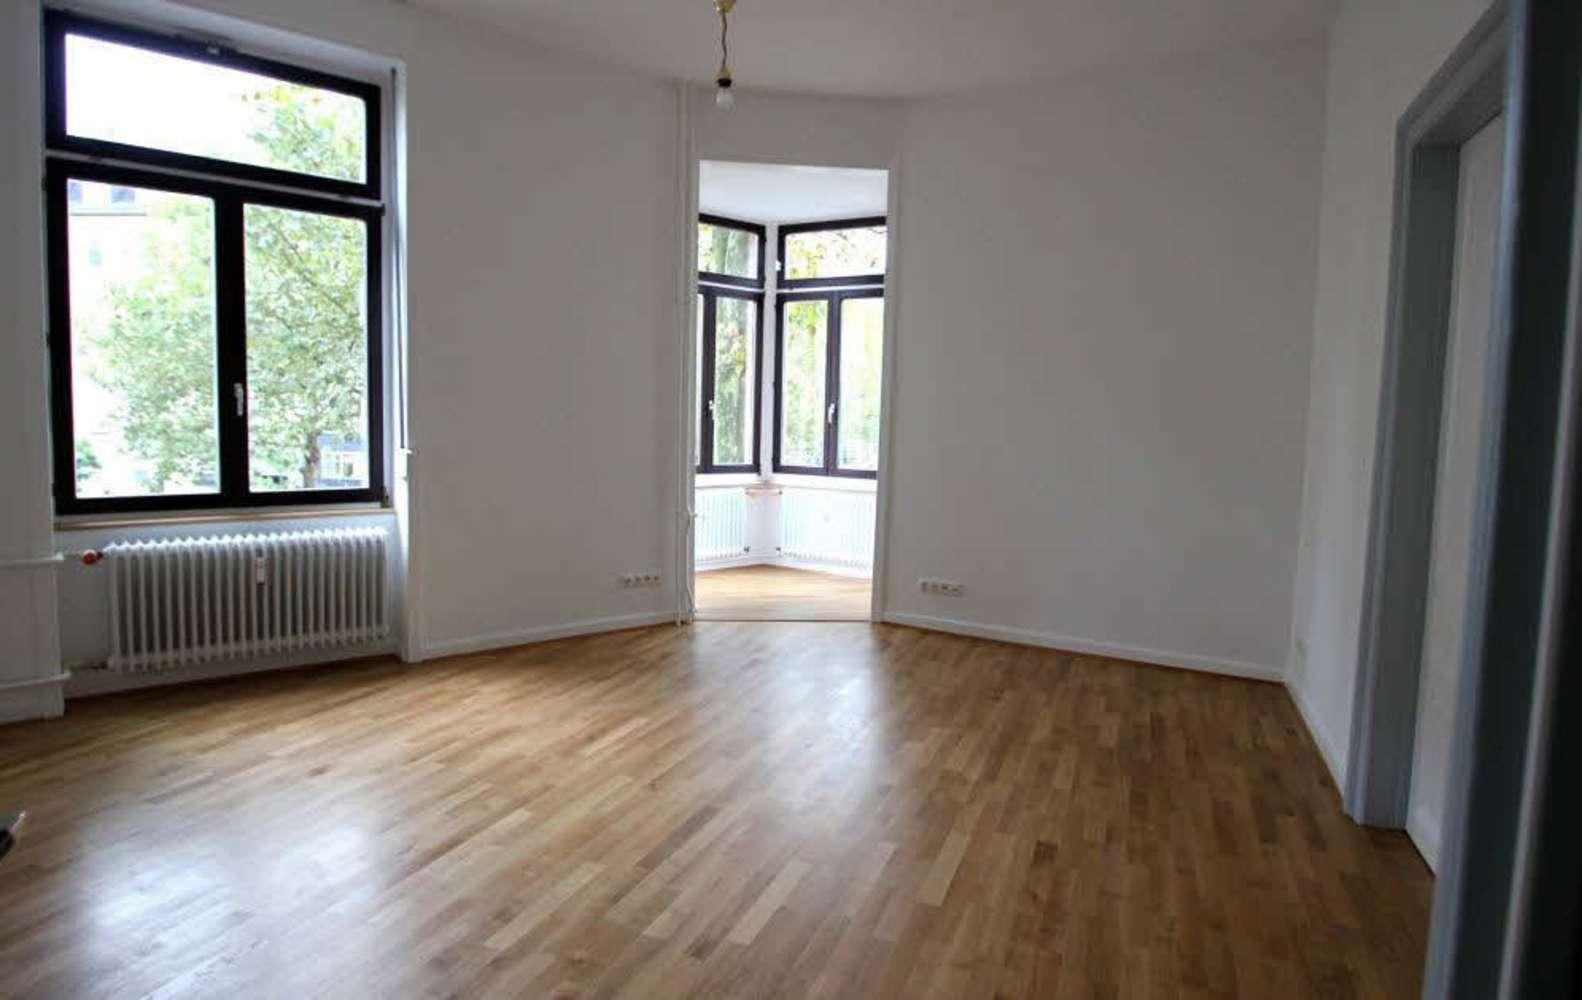 Büros Frankfurt am main, 60594 - Büro - Frankfurt am Main, Sachsenhausen - F2639 - 10338133